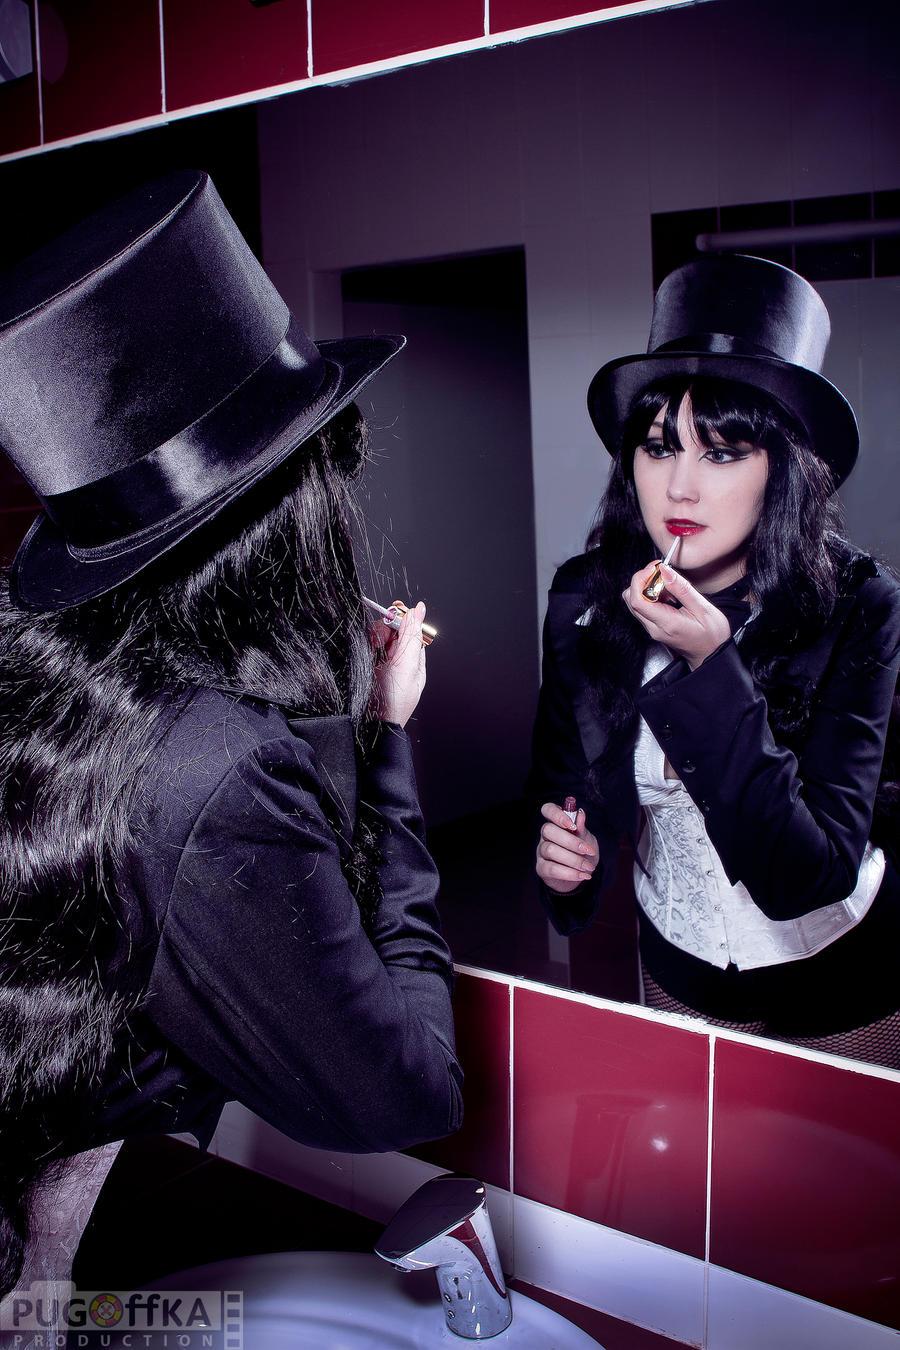 backstage - mirror by Reryuuzu